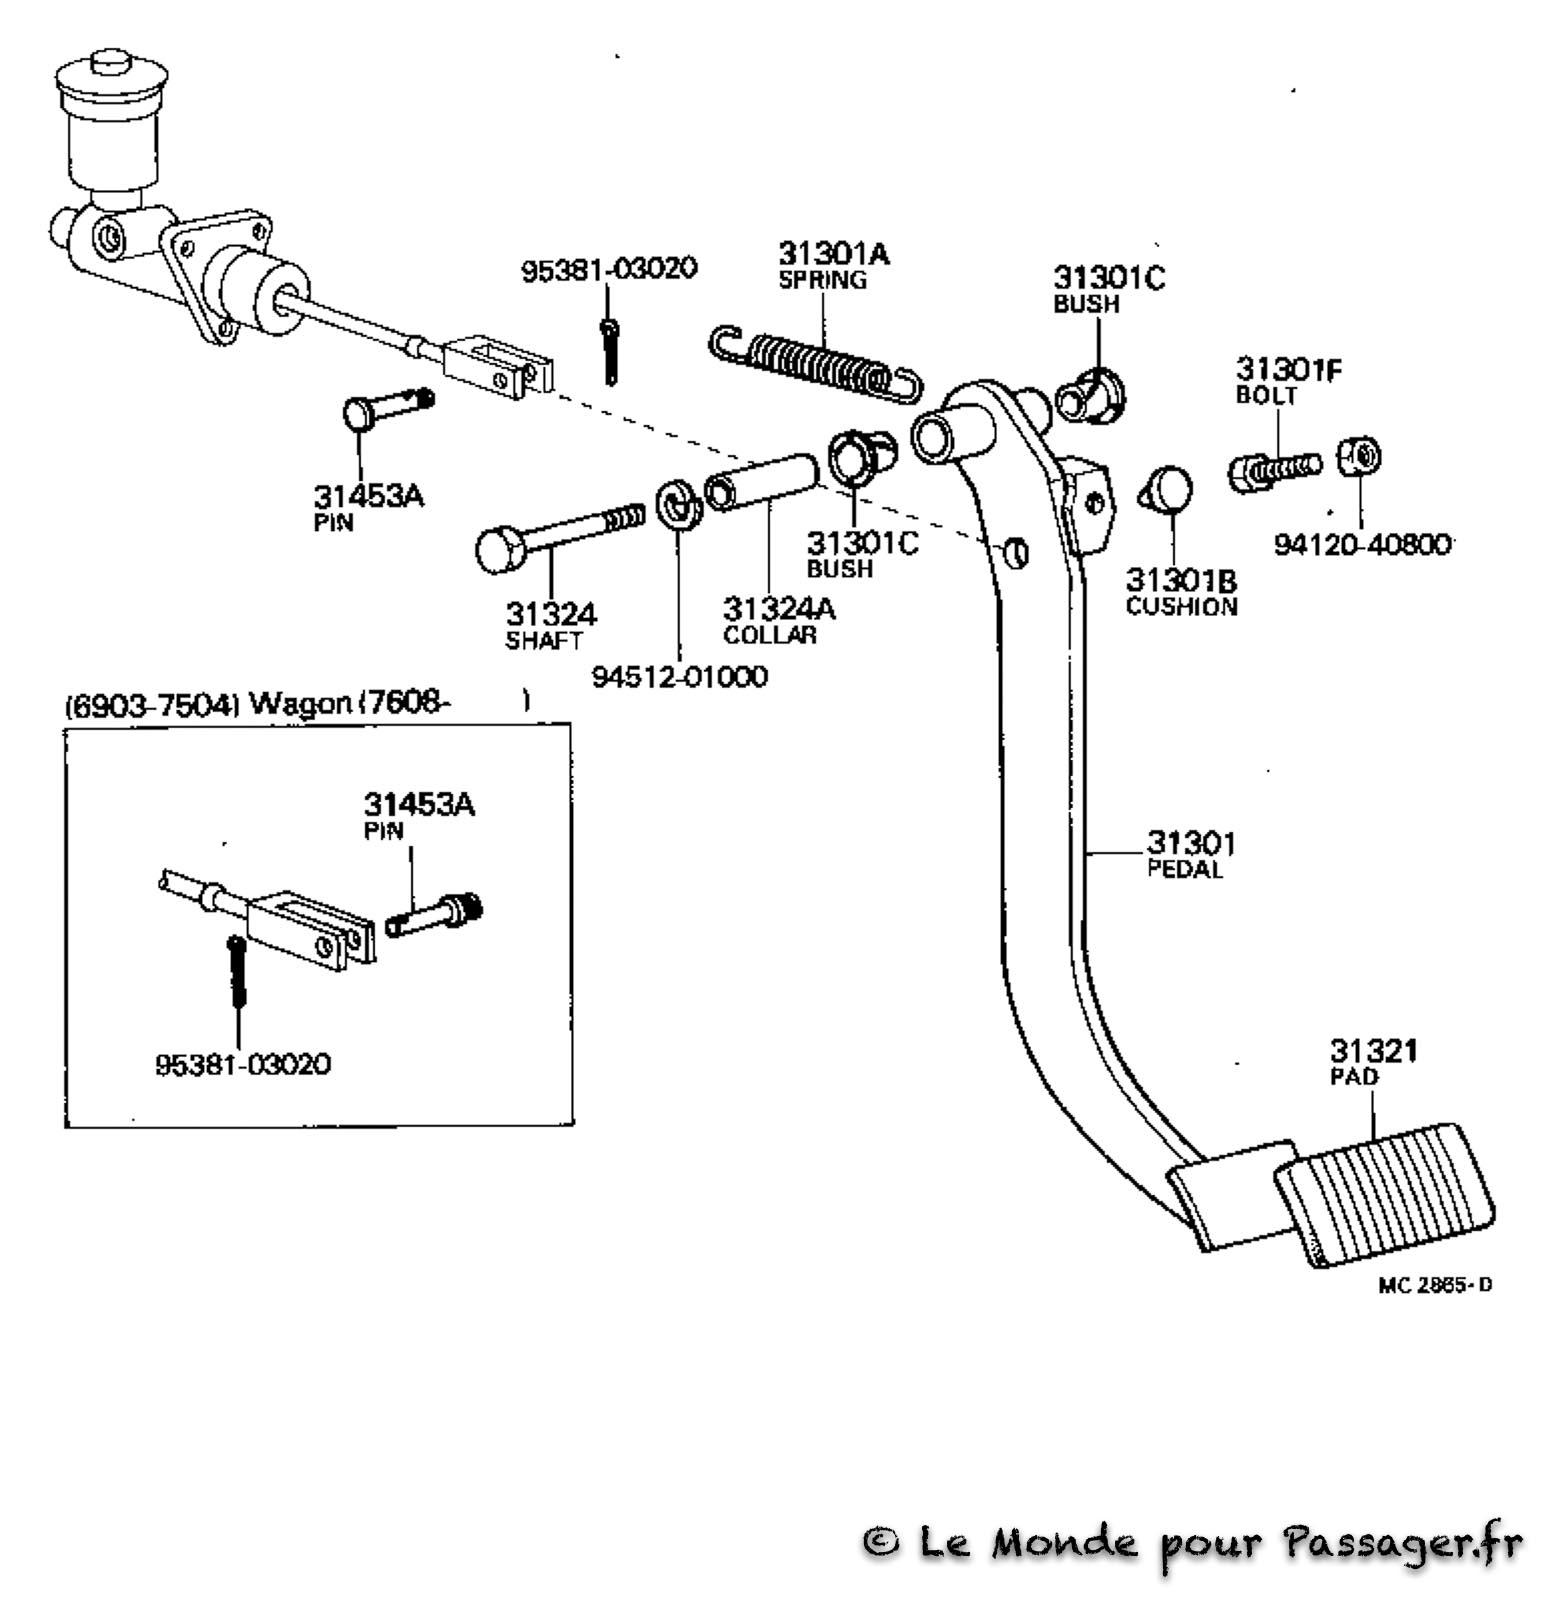 Fj55-Eclatés-Techniques013